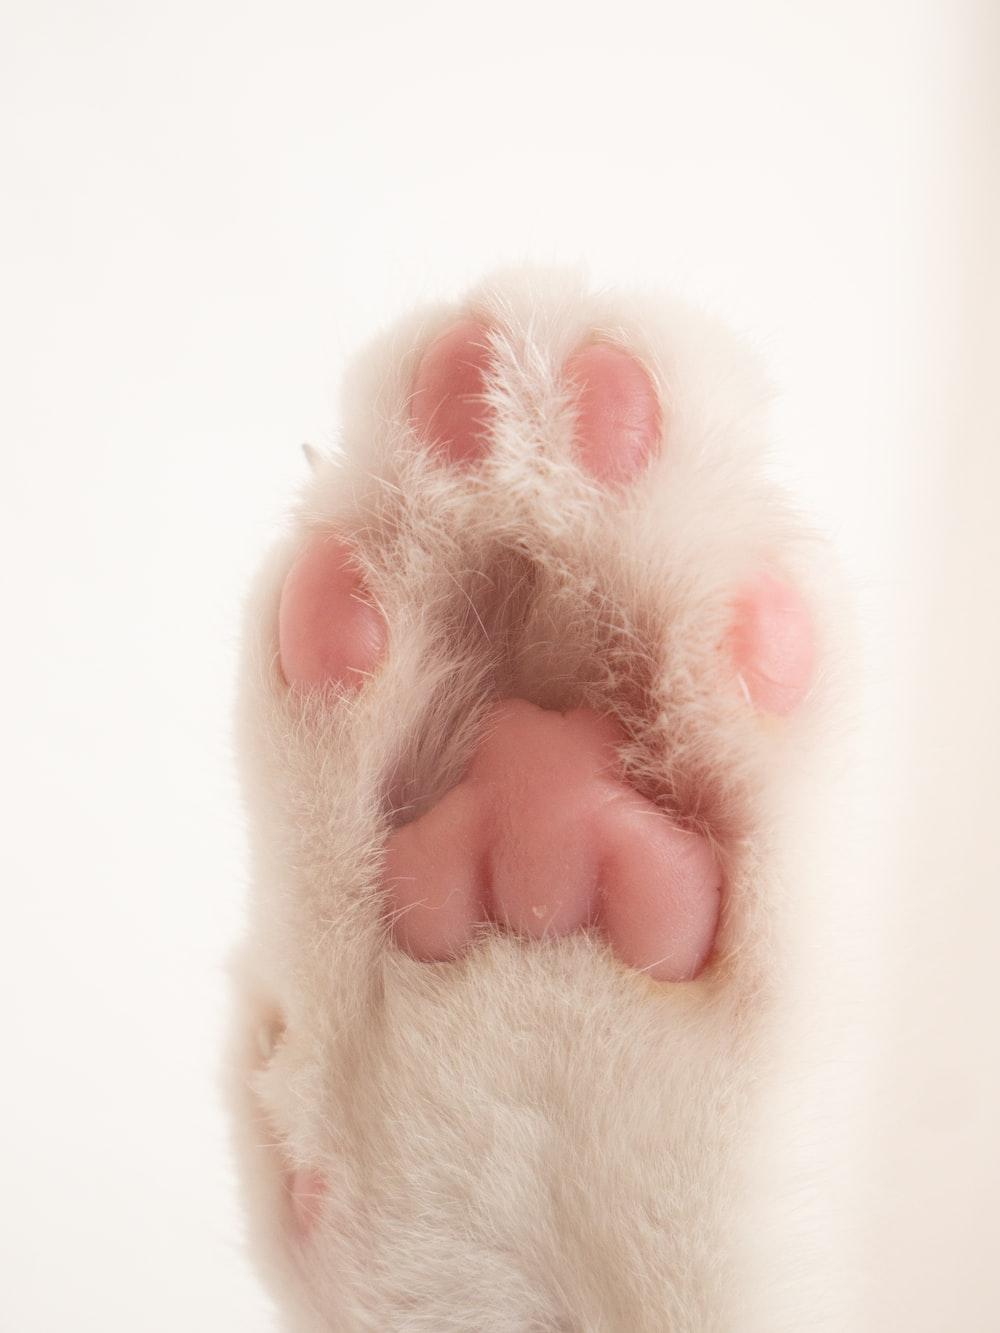 person holding white fur animal